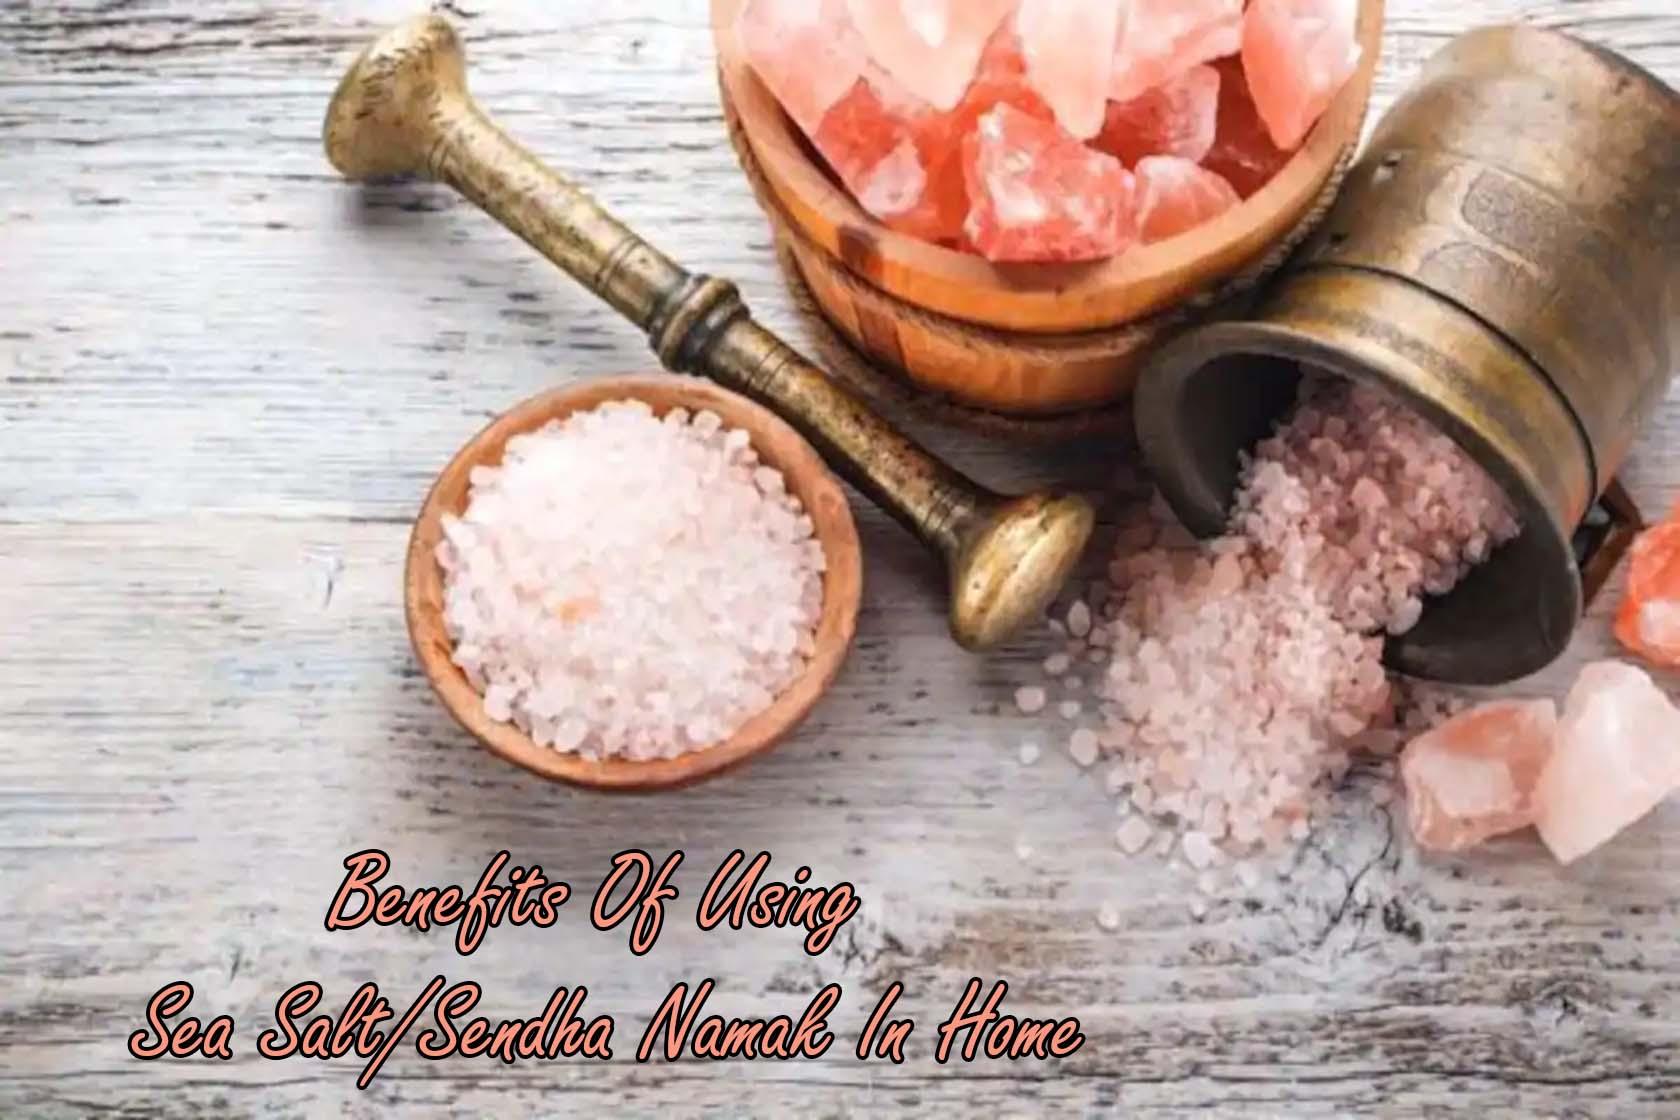 Benefits Of Using Sea Salt/Sendha Namak In-Home